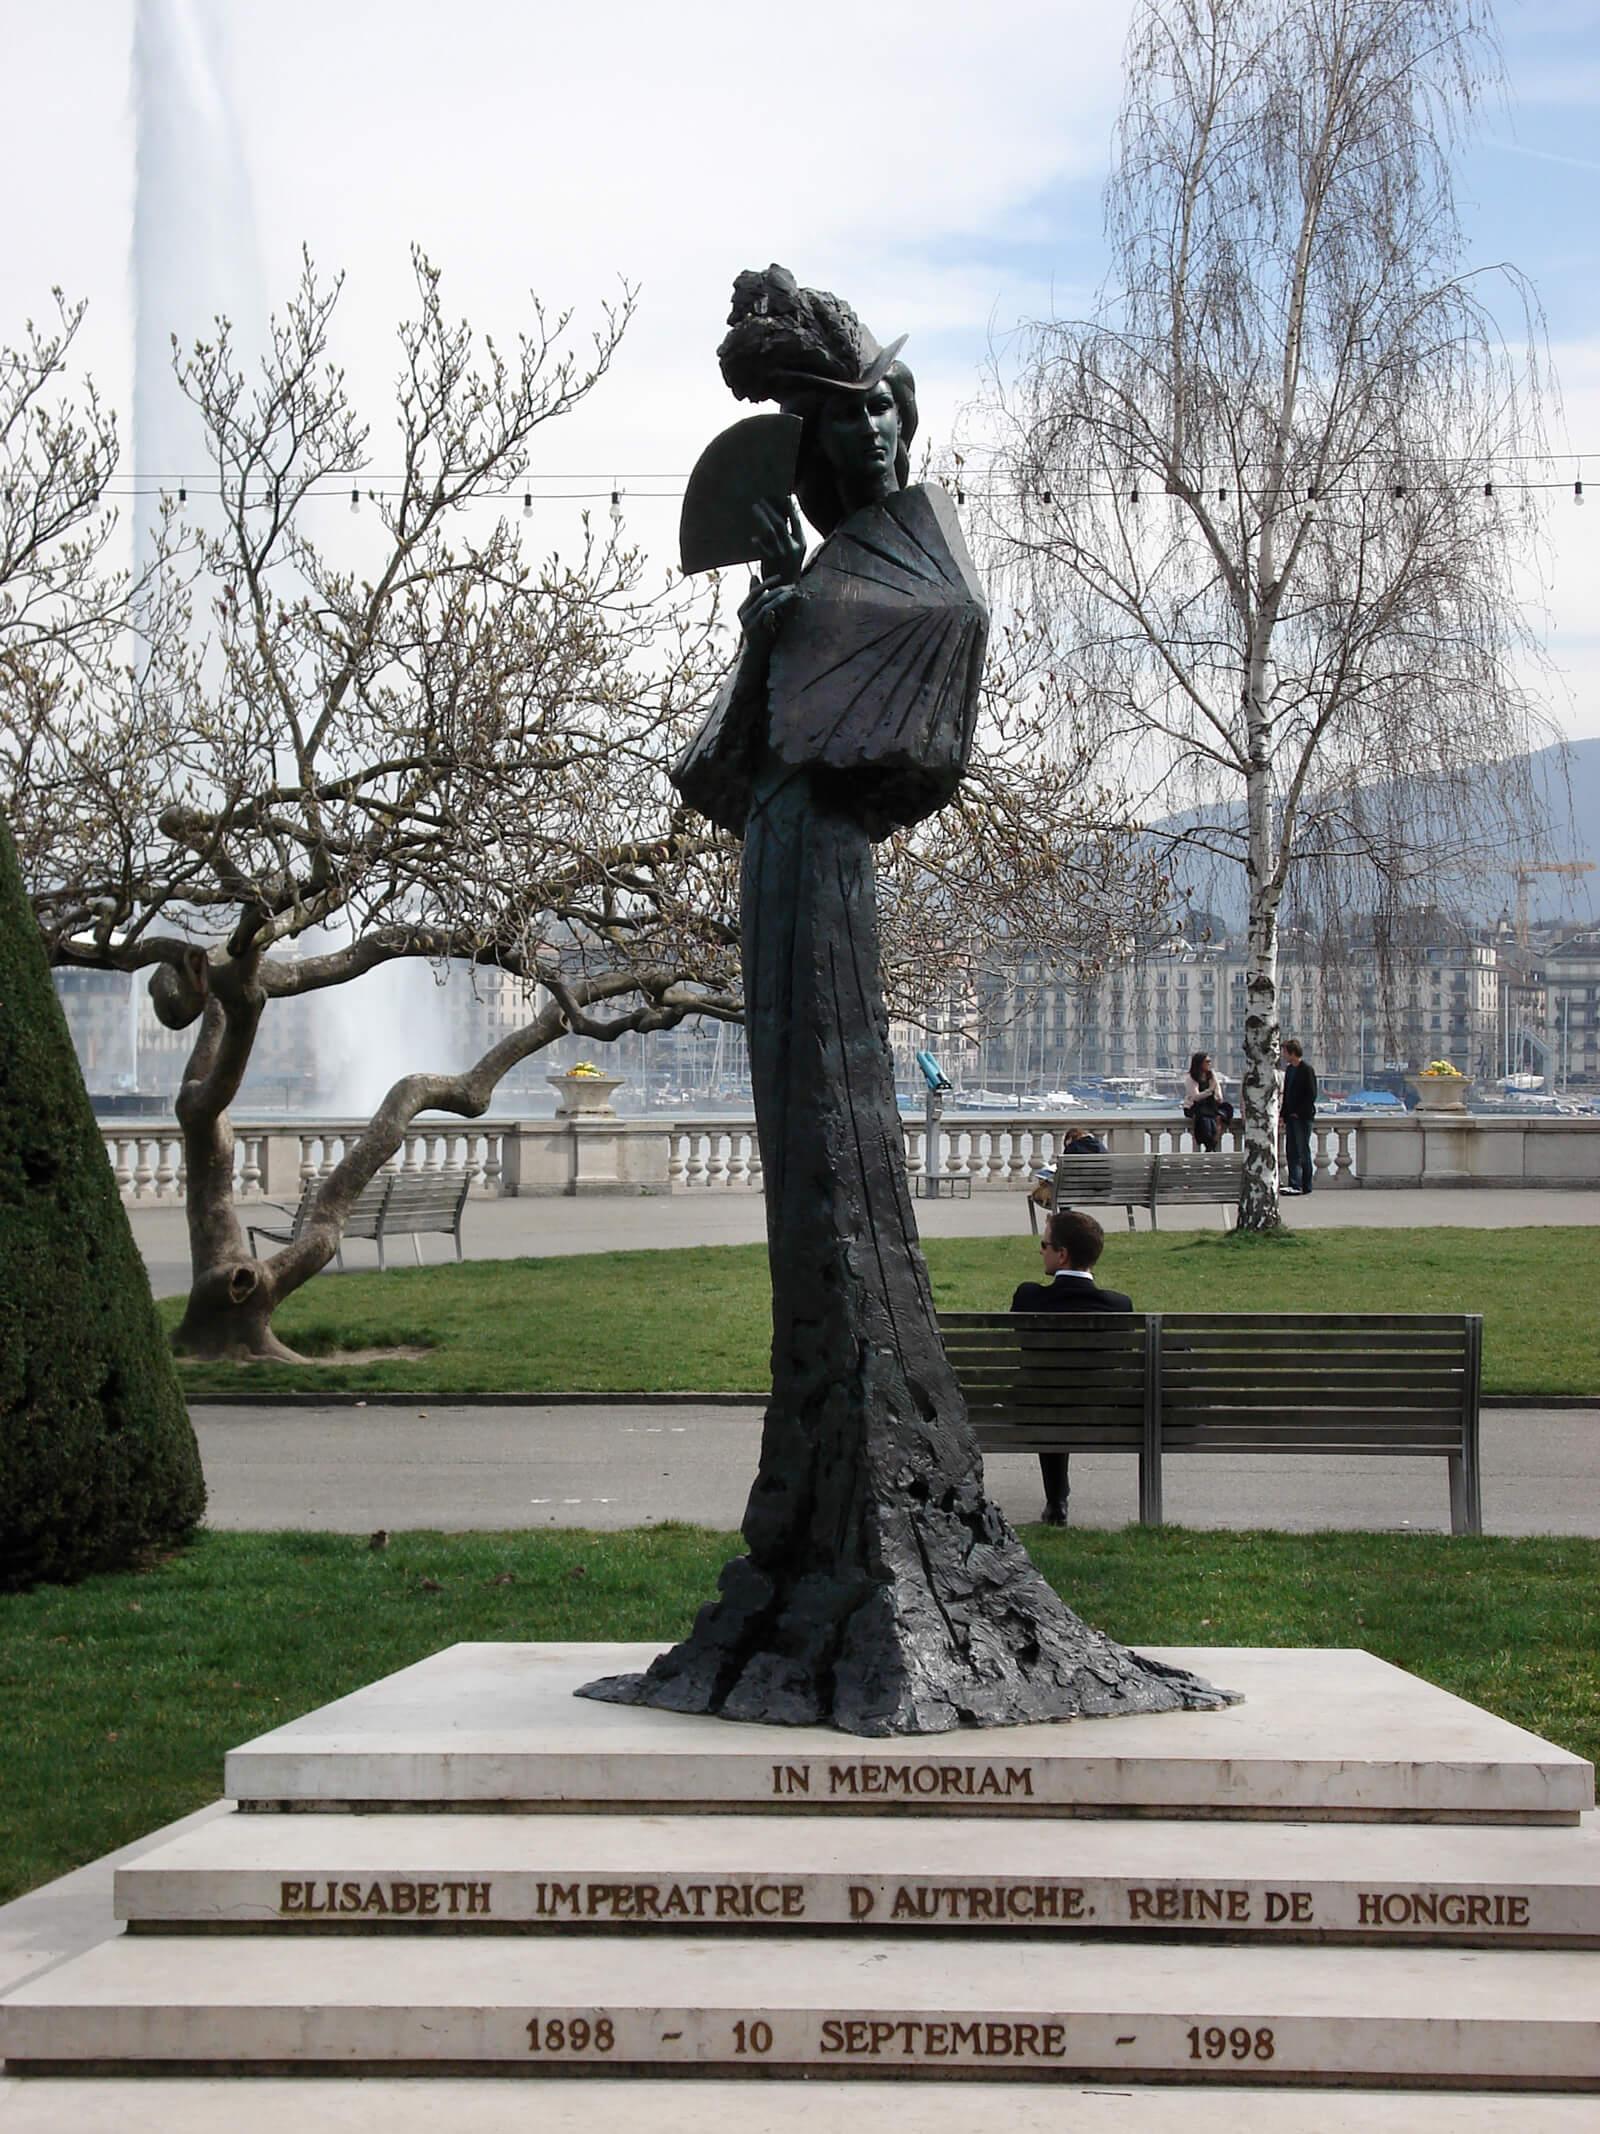 Empress Sissi Statue in Geneva, Switzerland